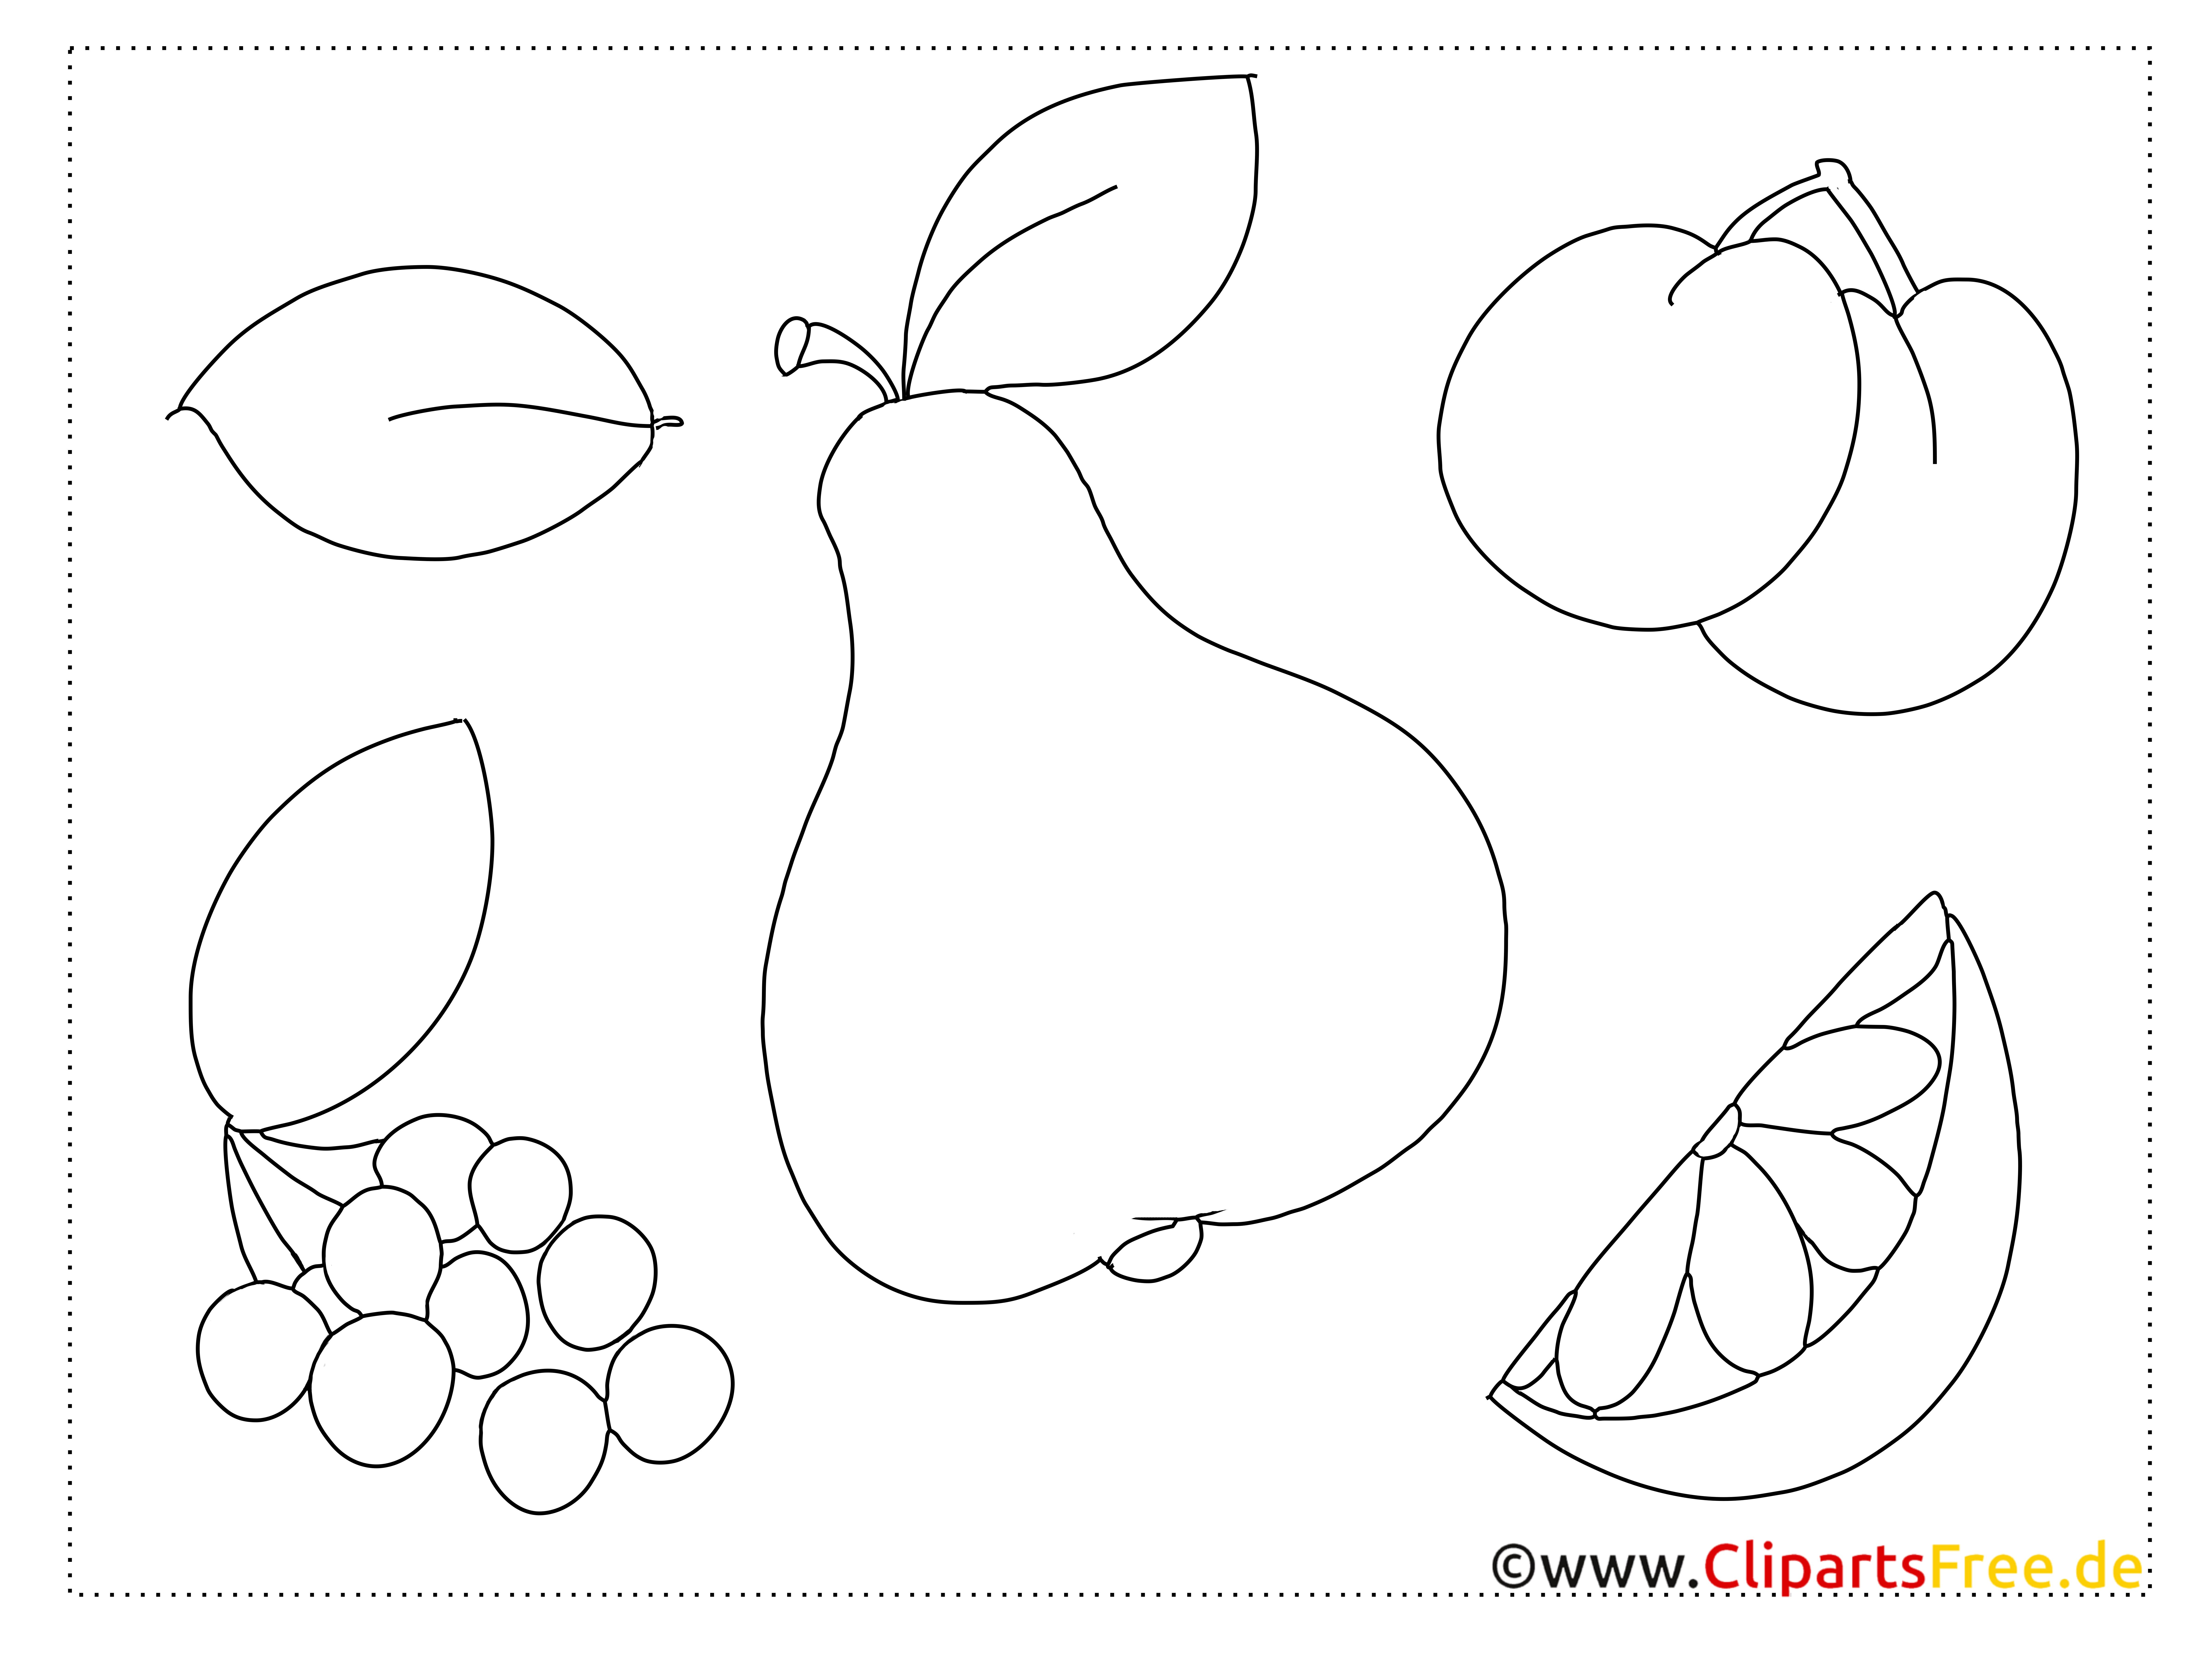 Obst Malvorlagen Kostenlos  Coloring and Malvorlagan